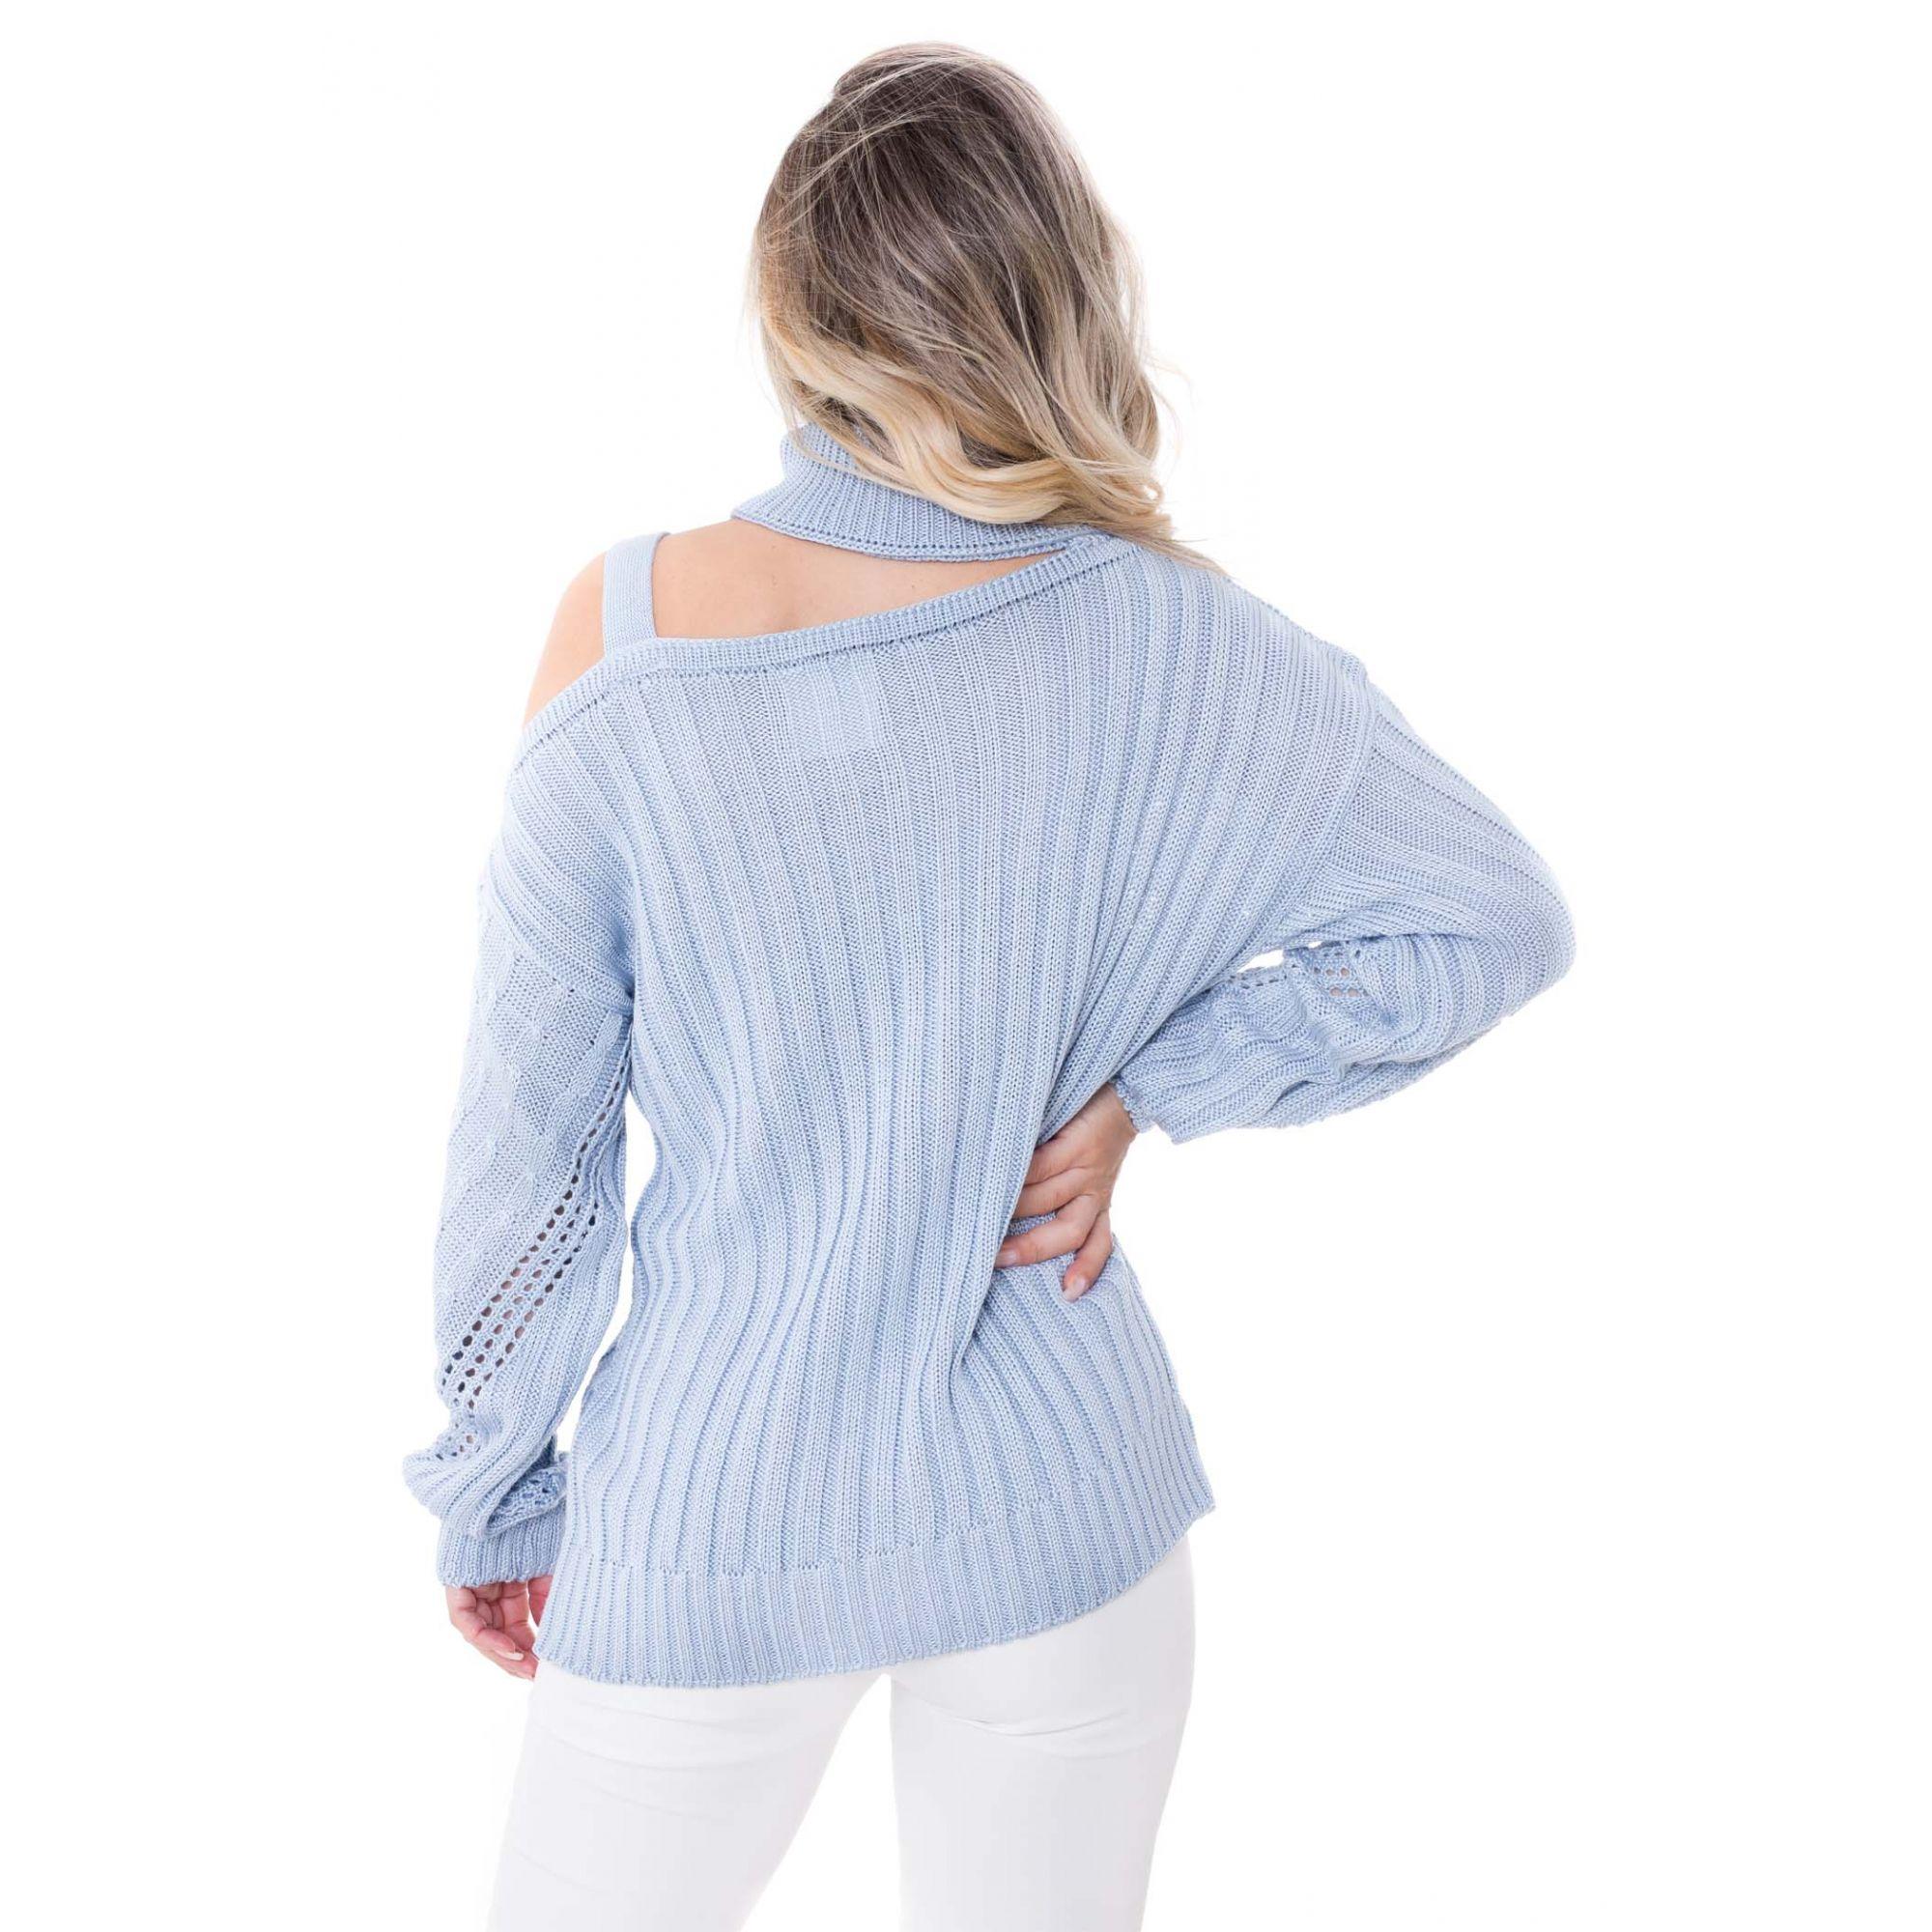 Blusa Manga Longa Gola Alta Vera Tricot Detalhe Ombro Feminina Azul Claro